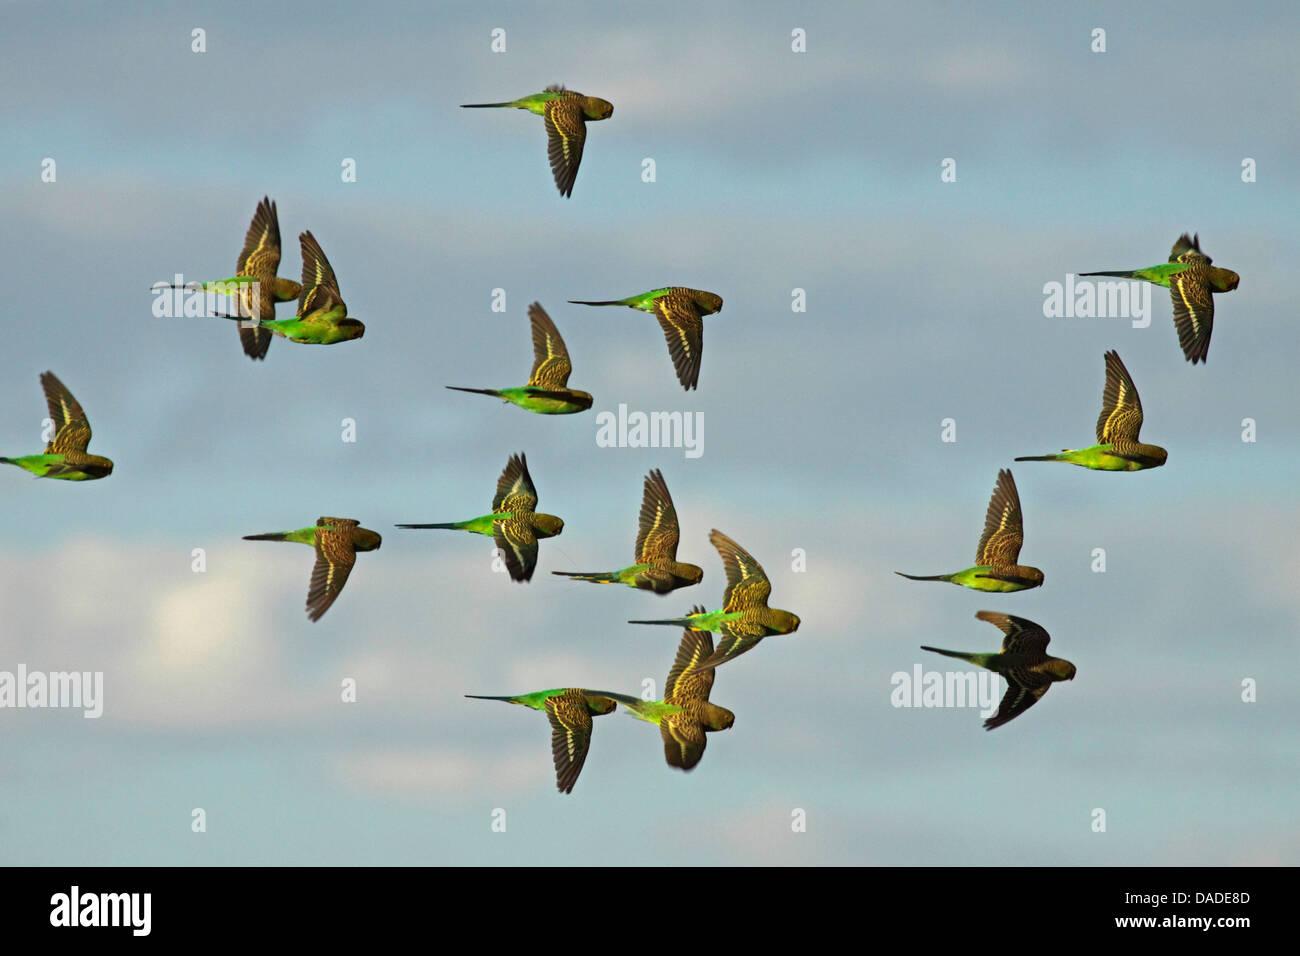 budgerigar, budgie, parakeet (Melopsittacus undulatus), flying flock, Australia, Northern Territory, Western MacDonnell - Stock Image